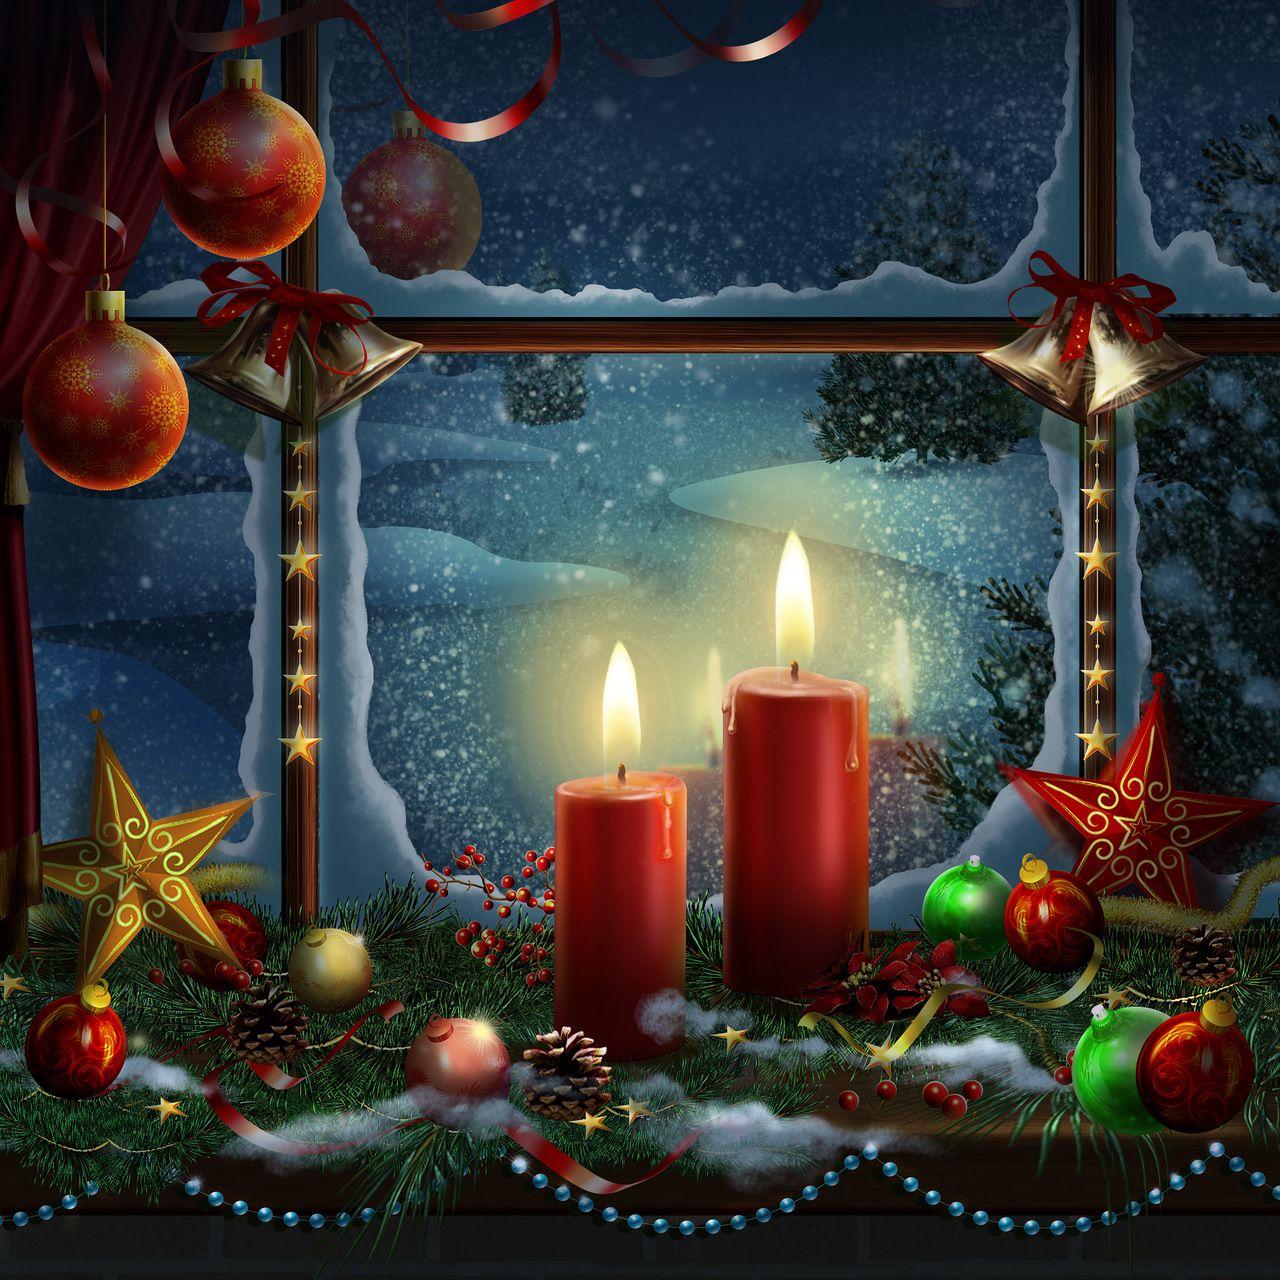 Pin von Lobanova Olga auf НГ (обои) | Pinterest | Weihnachten ...